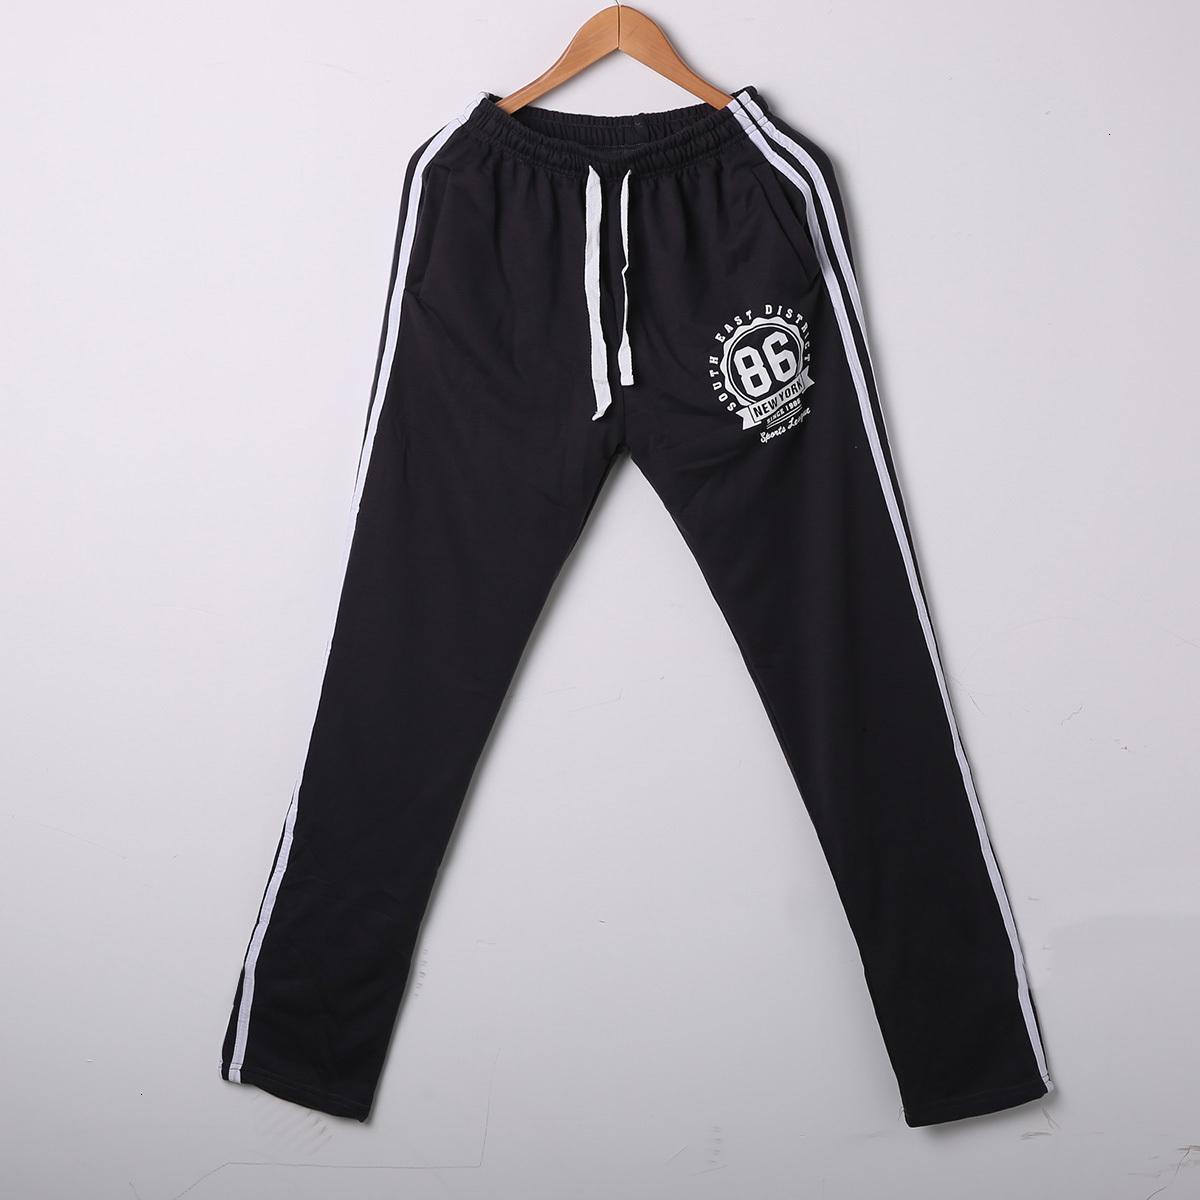 Hirigin Men Long Sweatpants Letter Printed Fitness Workout Joggers Cotton Soft Pants Belt Style Men's Fashion Loose Outwear